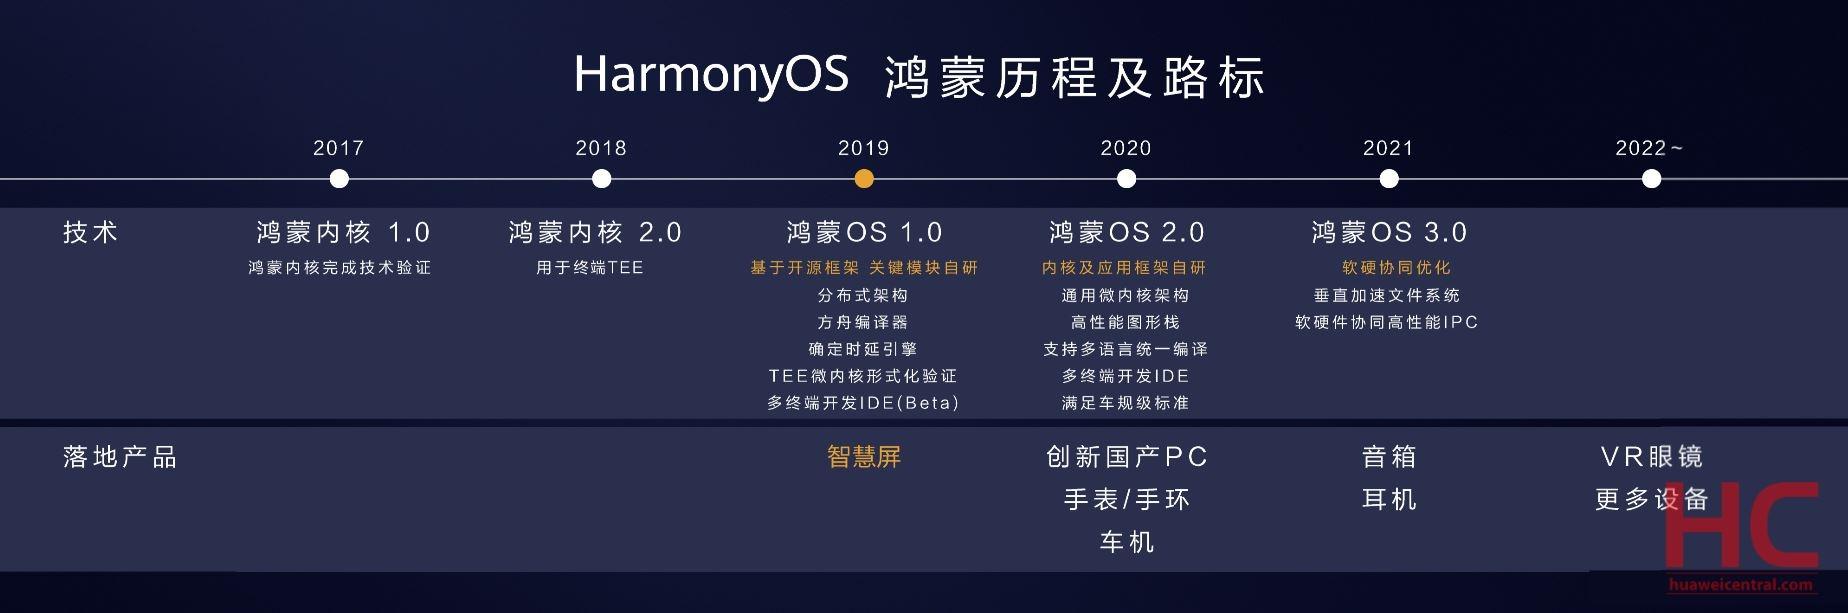 harmony-os-part-2-timeline